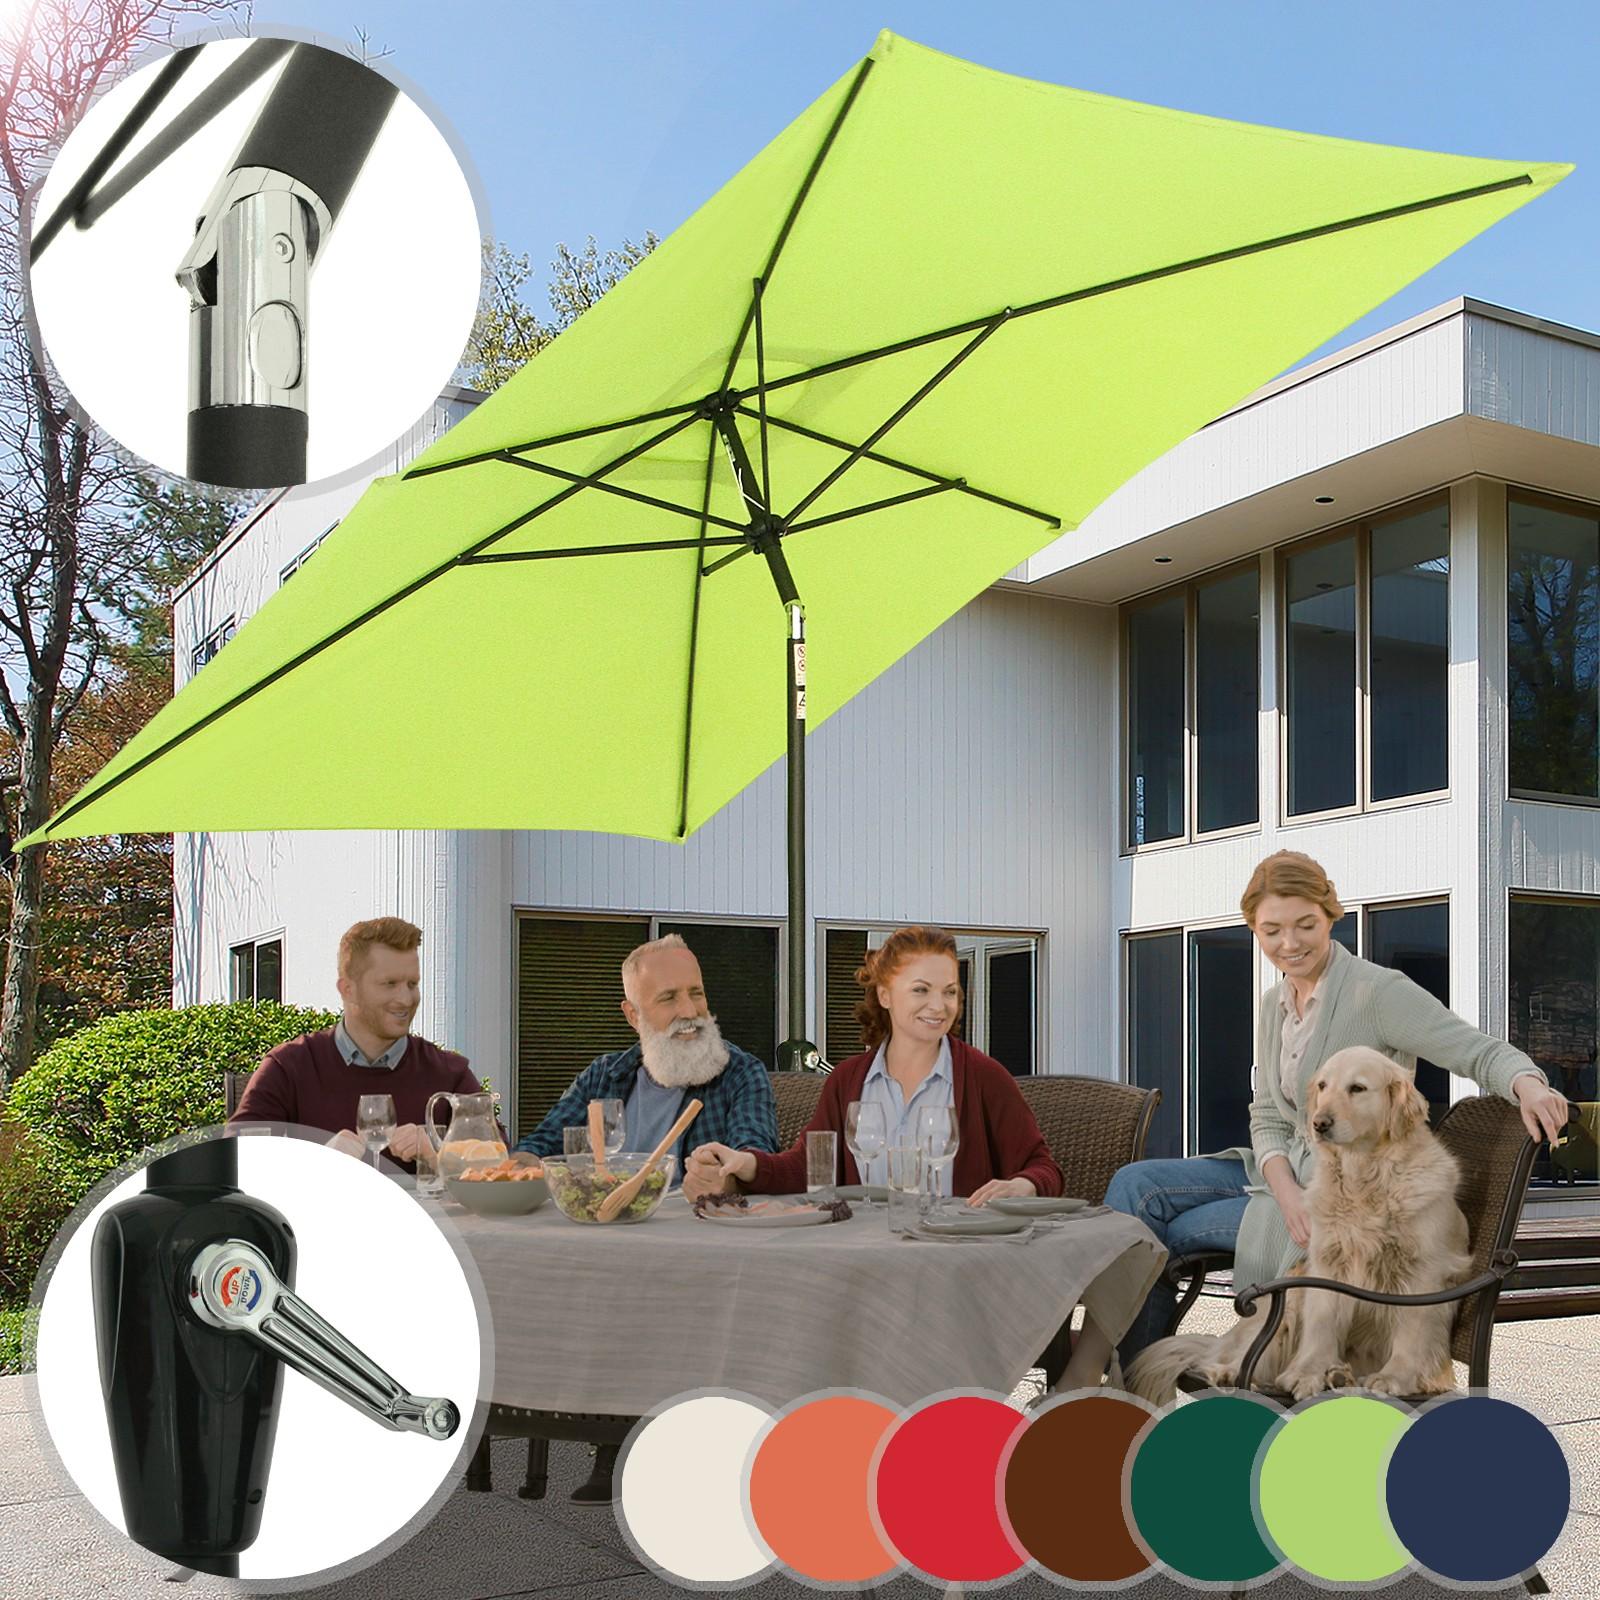 sonnenschirm 2x3m rechteckig balkonschirm marktschirm. Black Bedroom Furniture Sets. Home Design Ideas